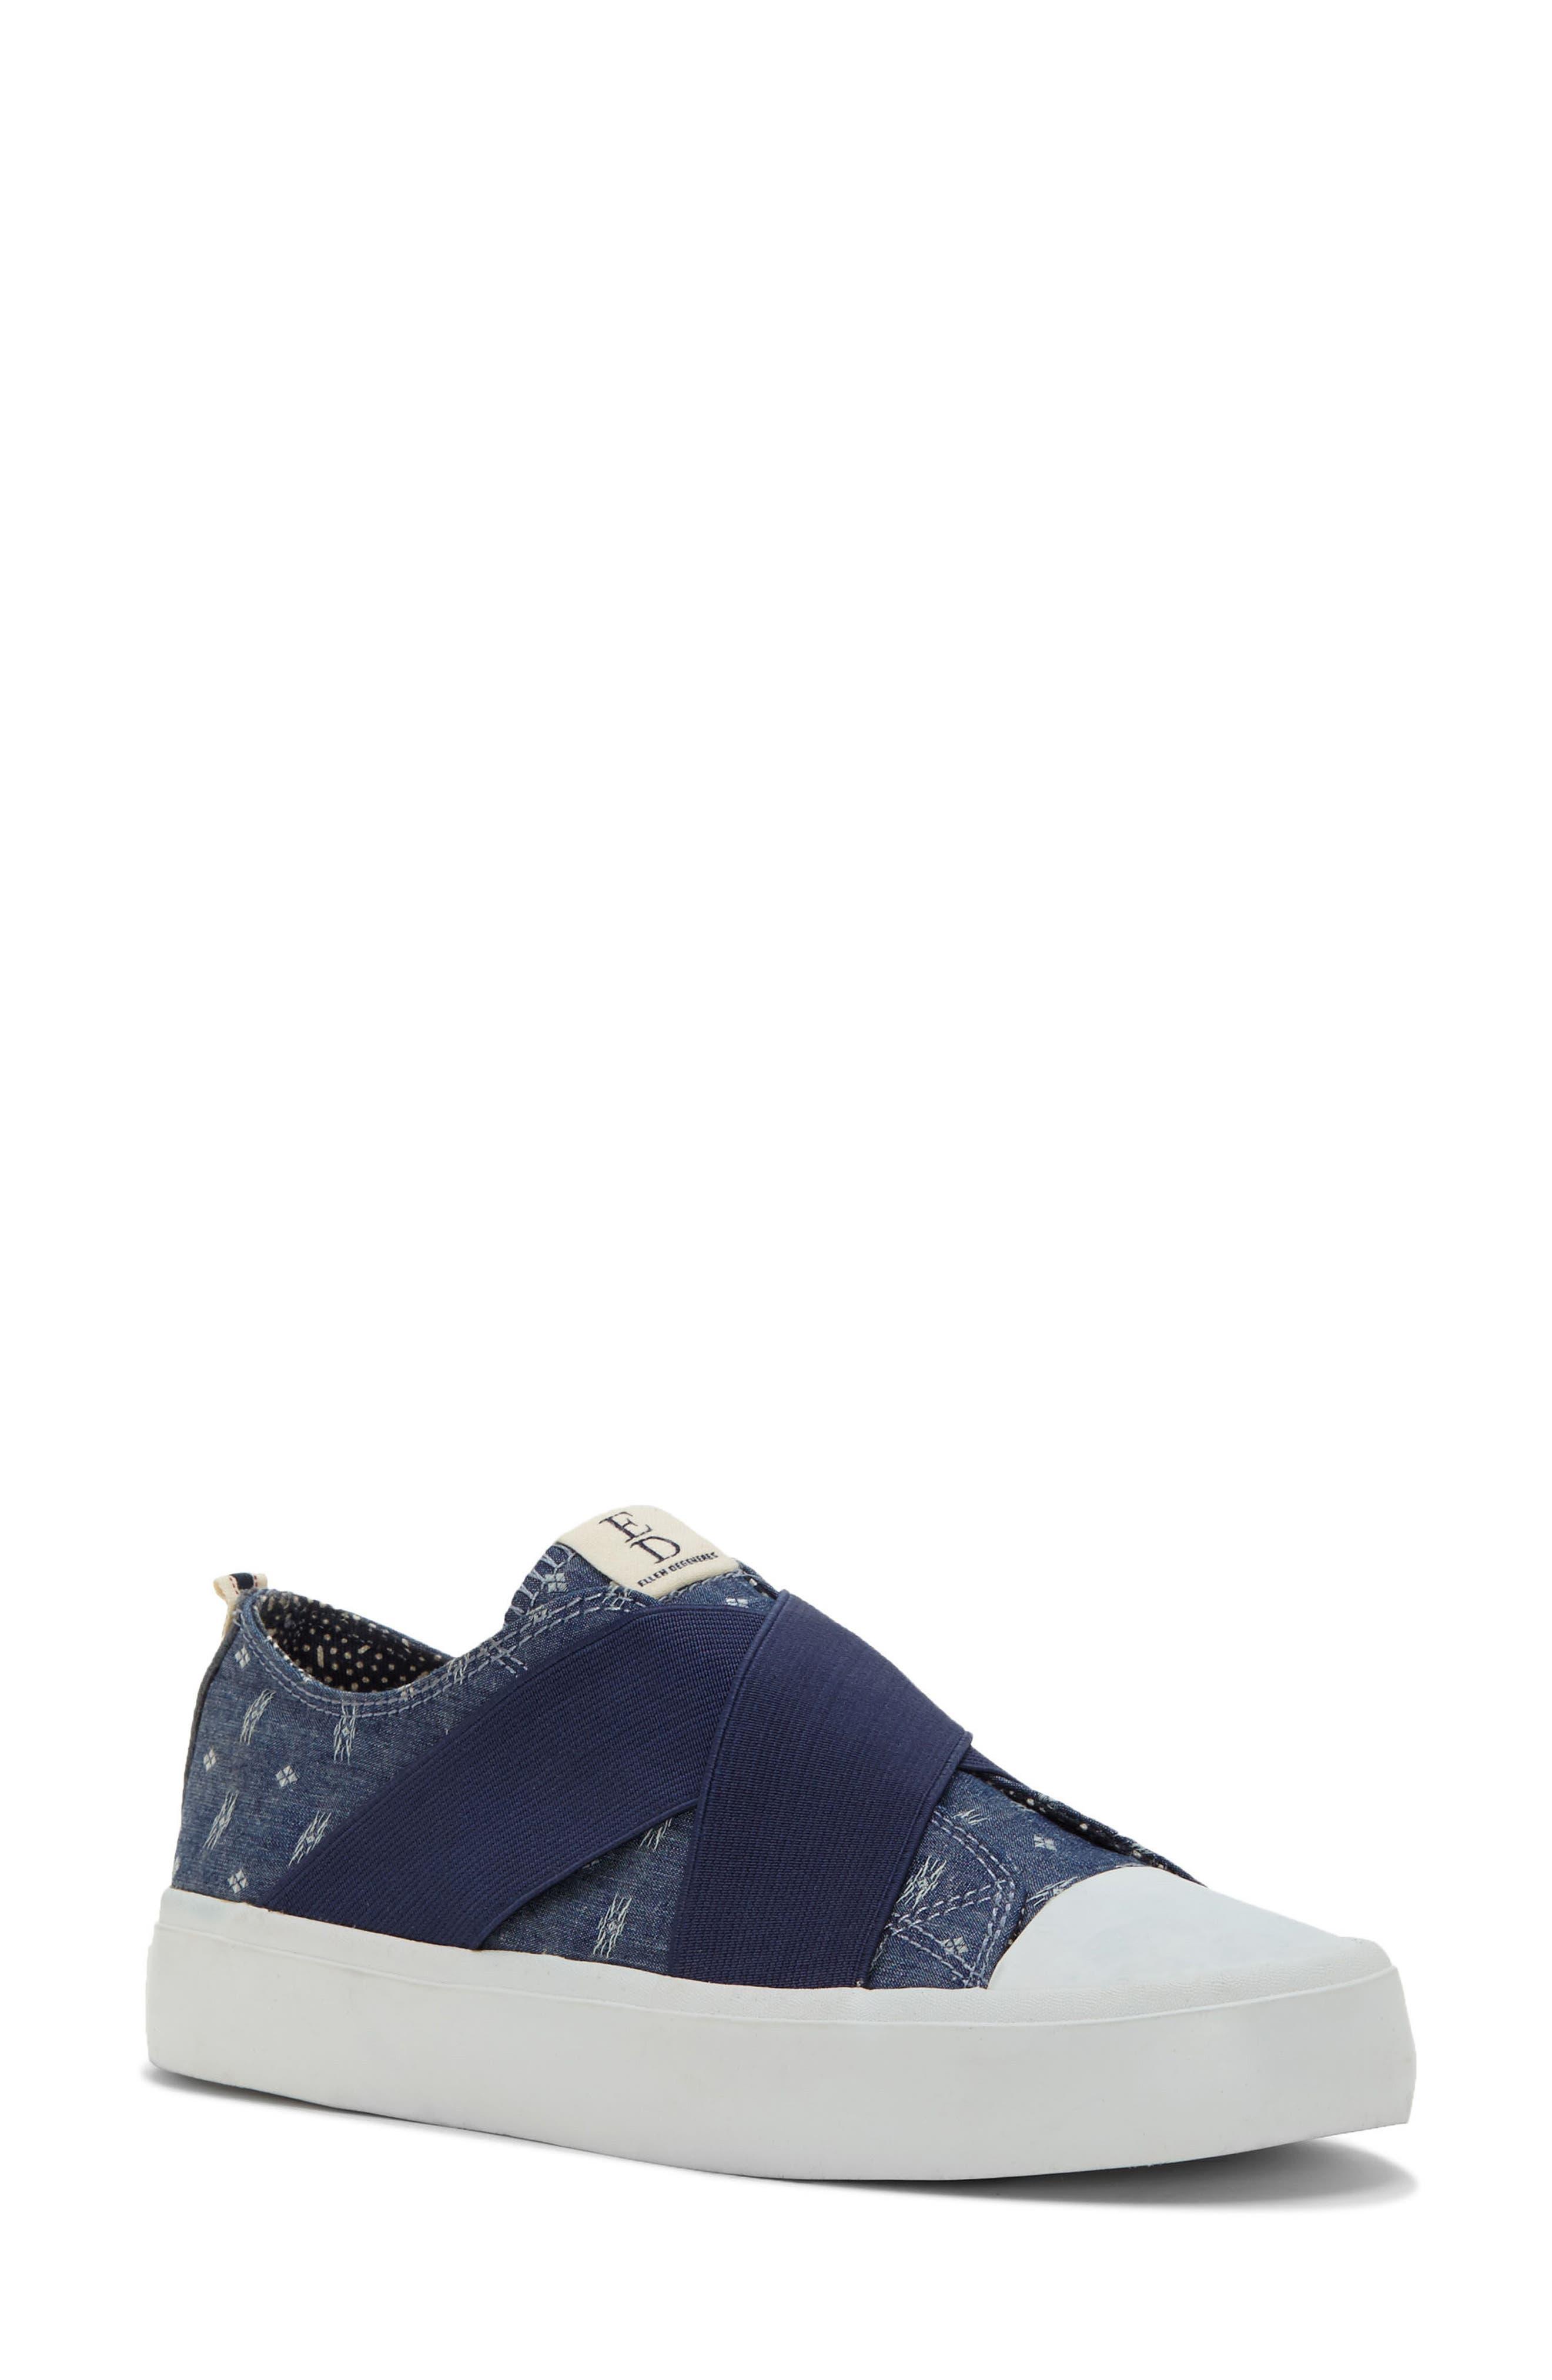 Main Image - ED Ellen DeGeneres Daichi Slip-On Sneaker (Women)